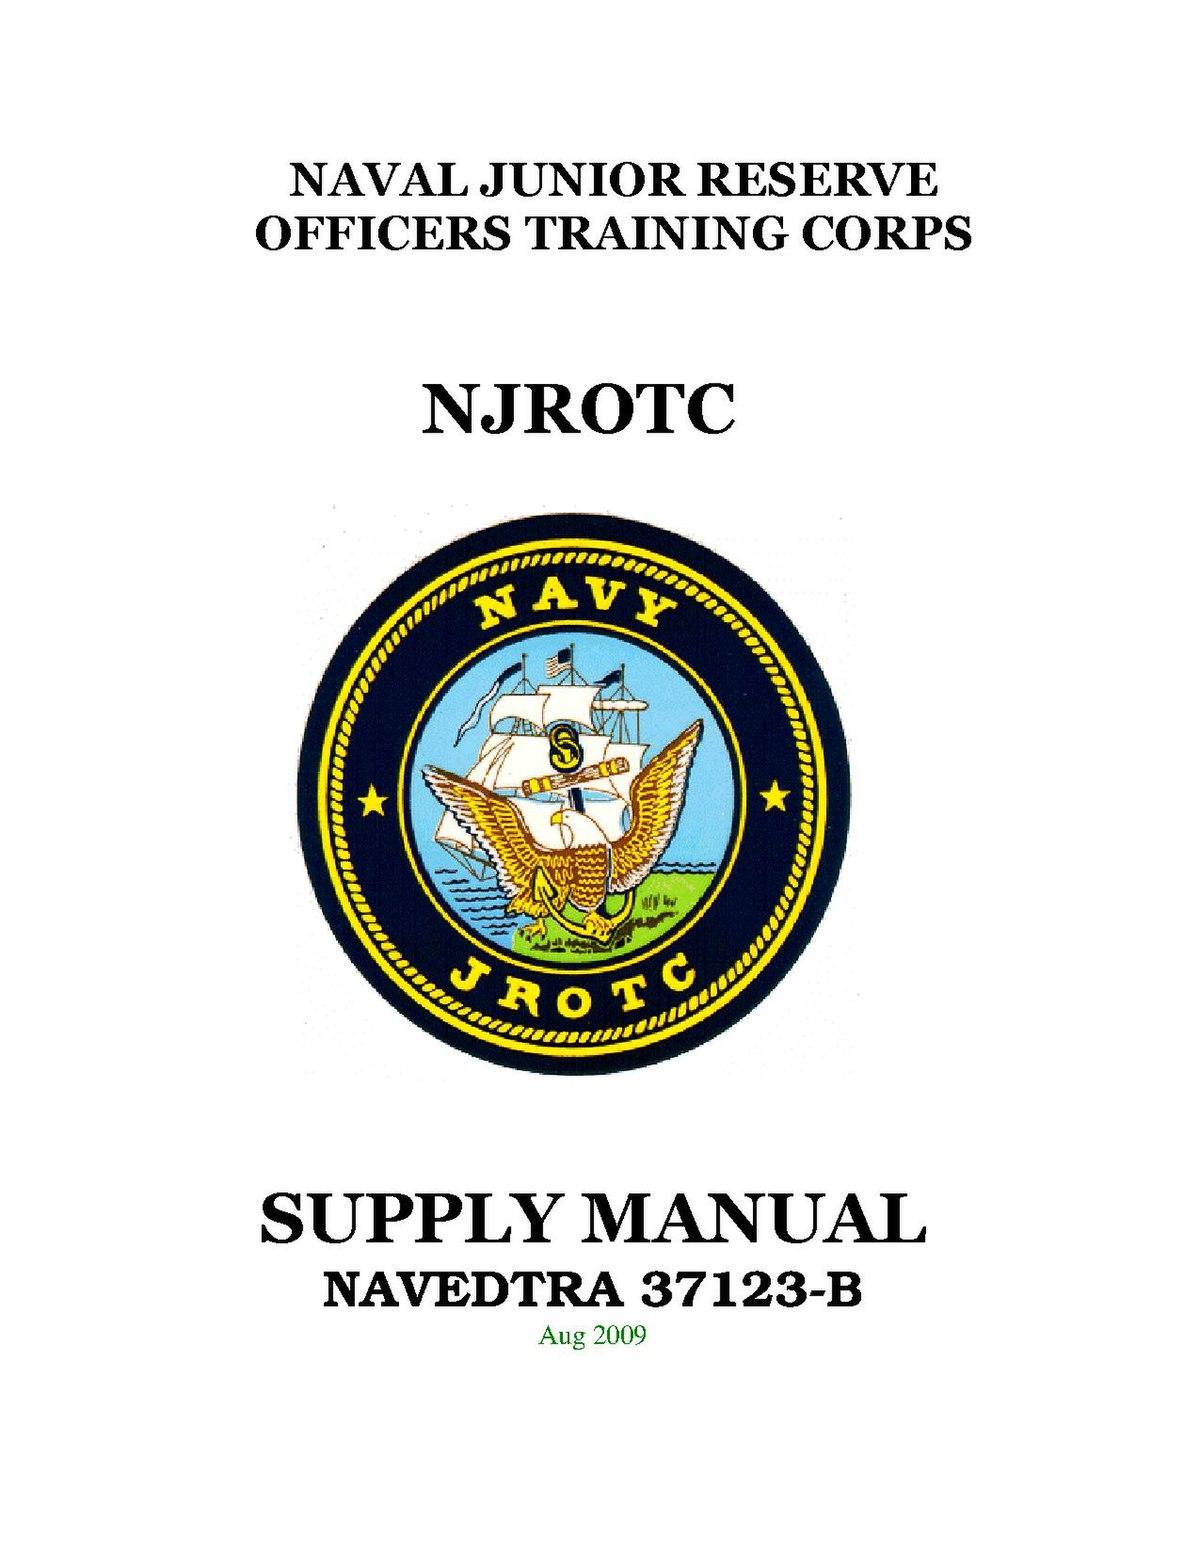 File:NAVEDTRA 37123-B - NJROTC Supply Manual (August 2009).pdf ...